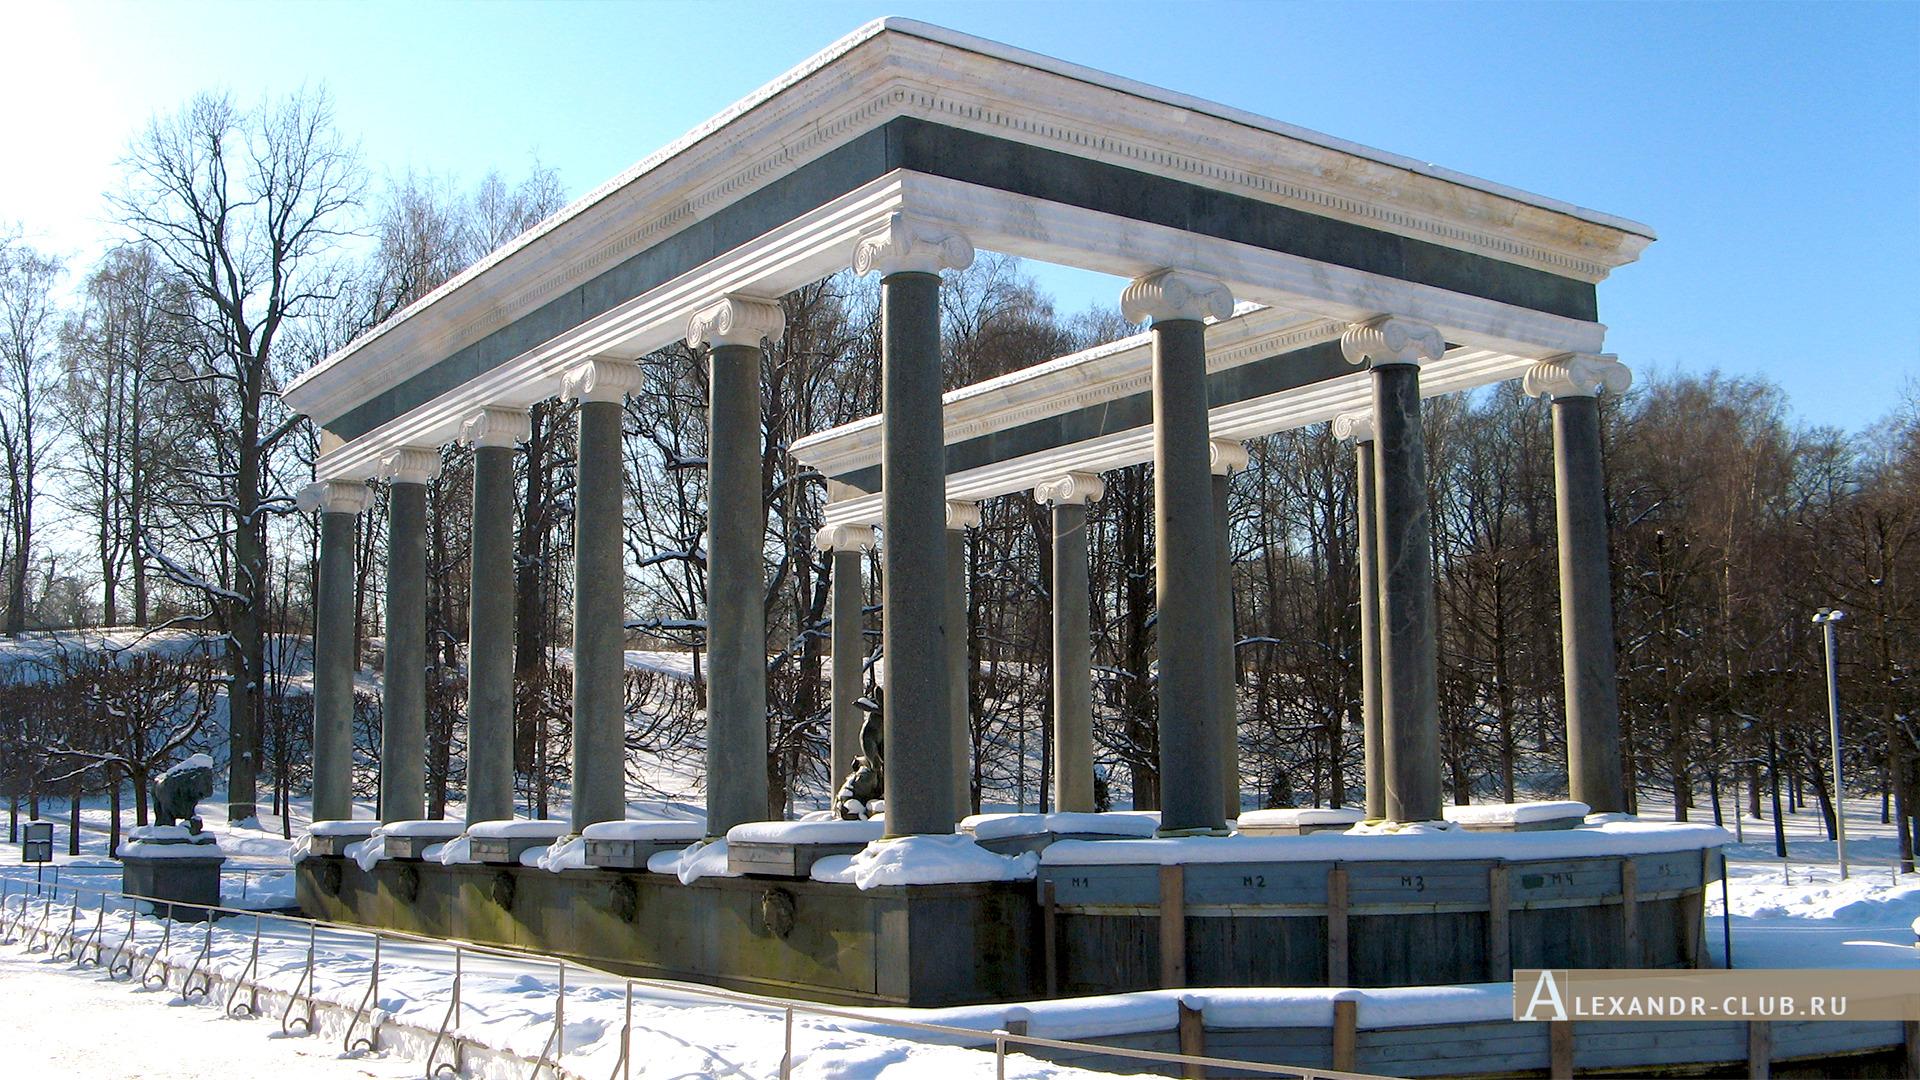 Петергоф, зима, Нижний парк, фонтан «Львиный каскад» – 3